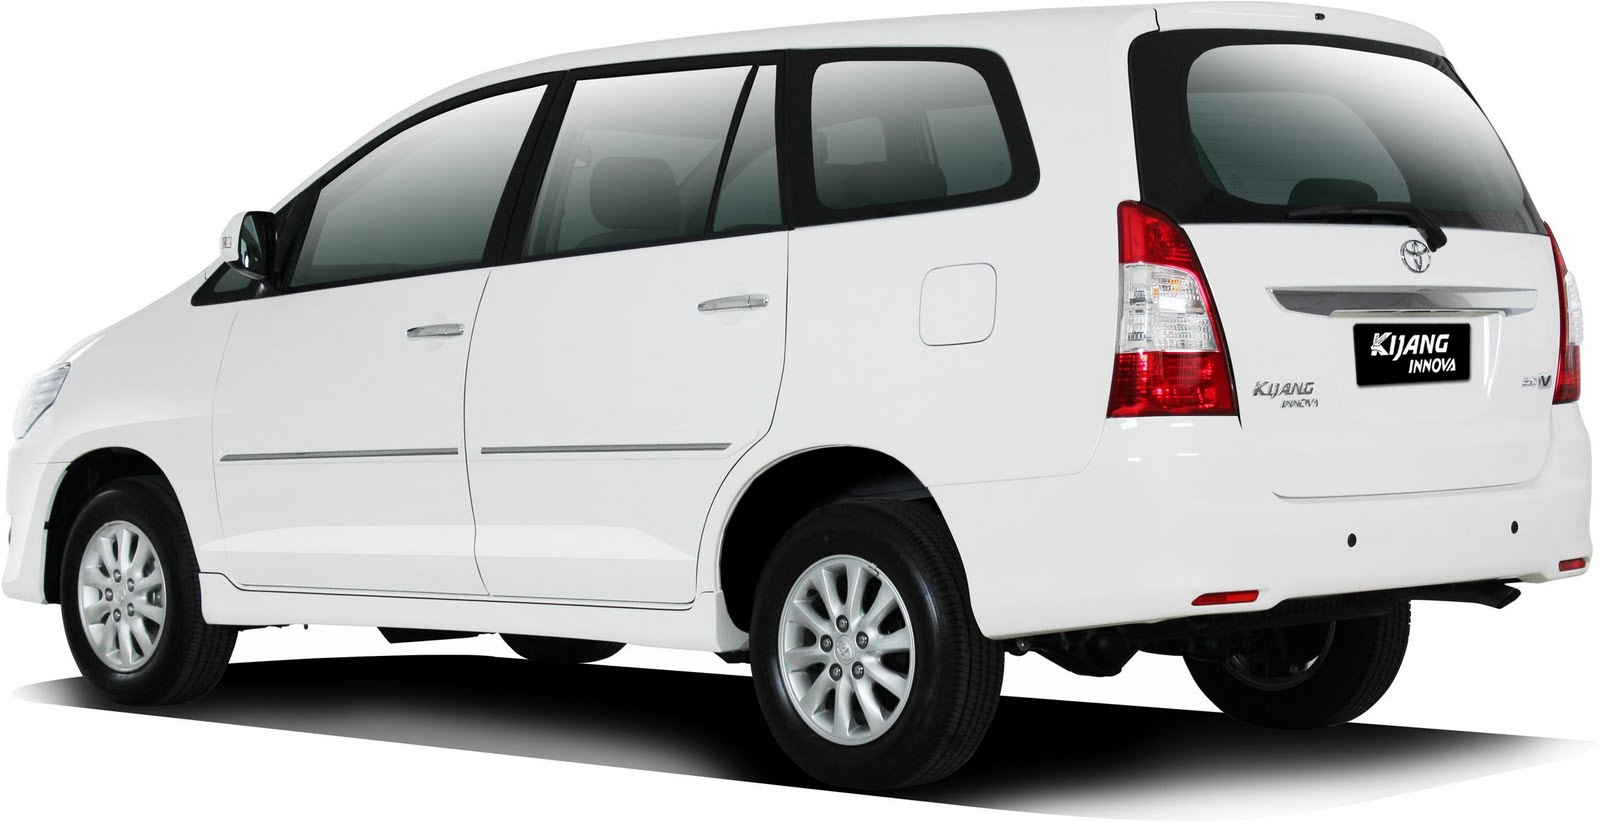 all new kijang innova 2.4 g at diesel harga agya trd mobil inova valorro